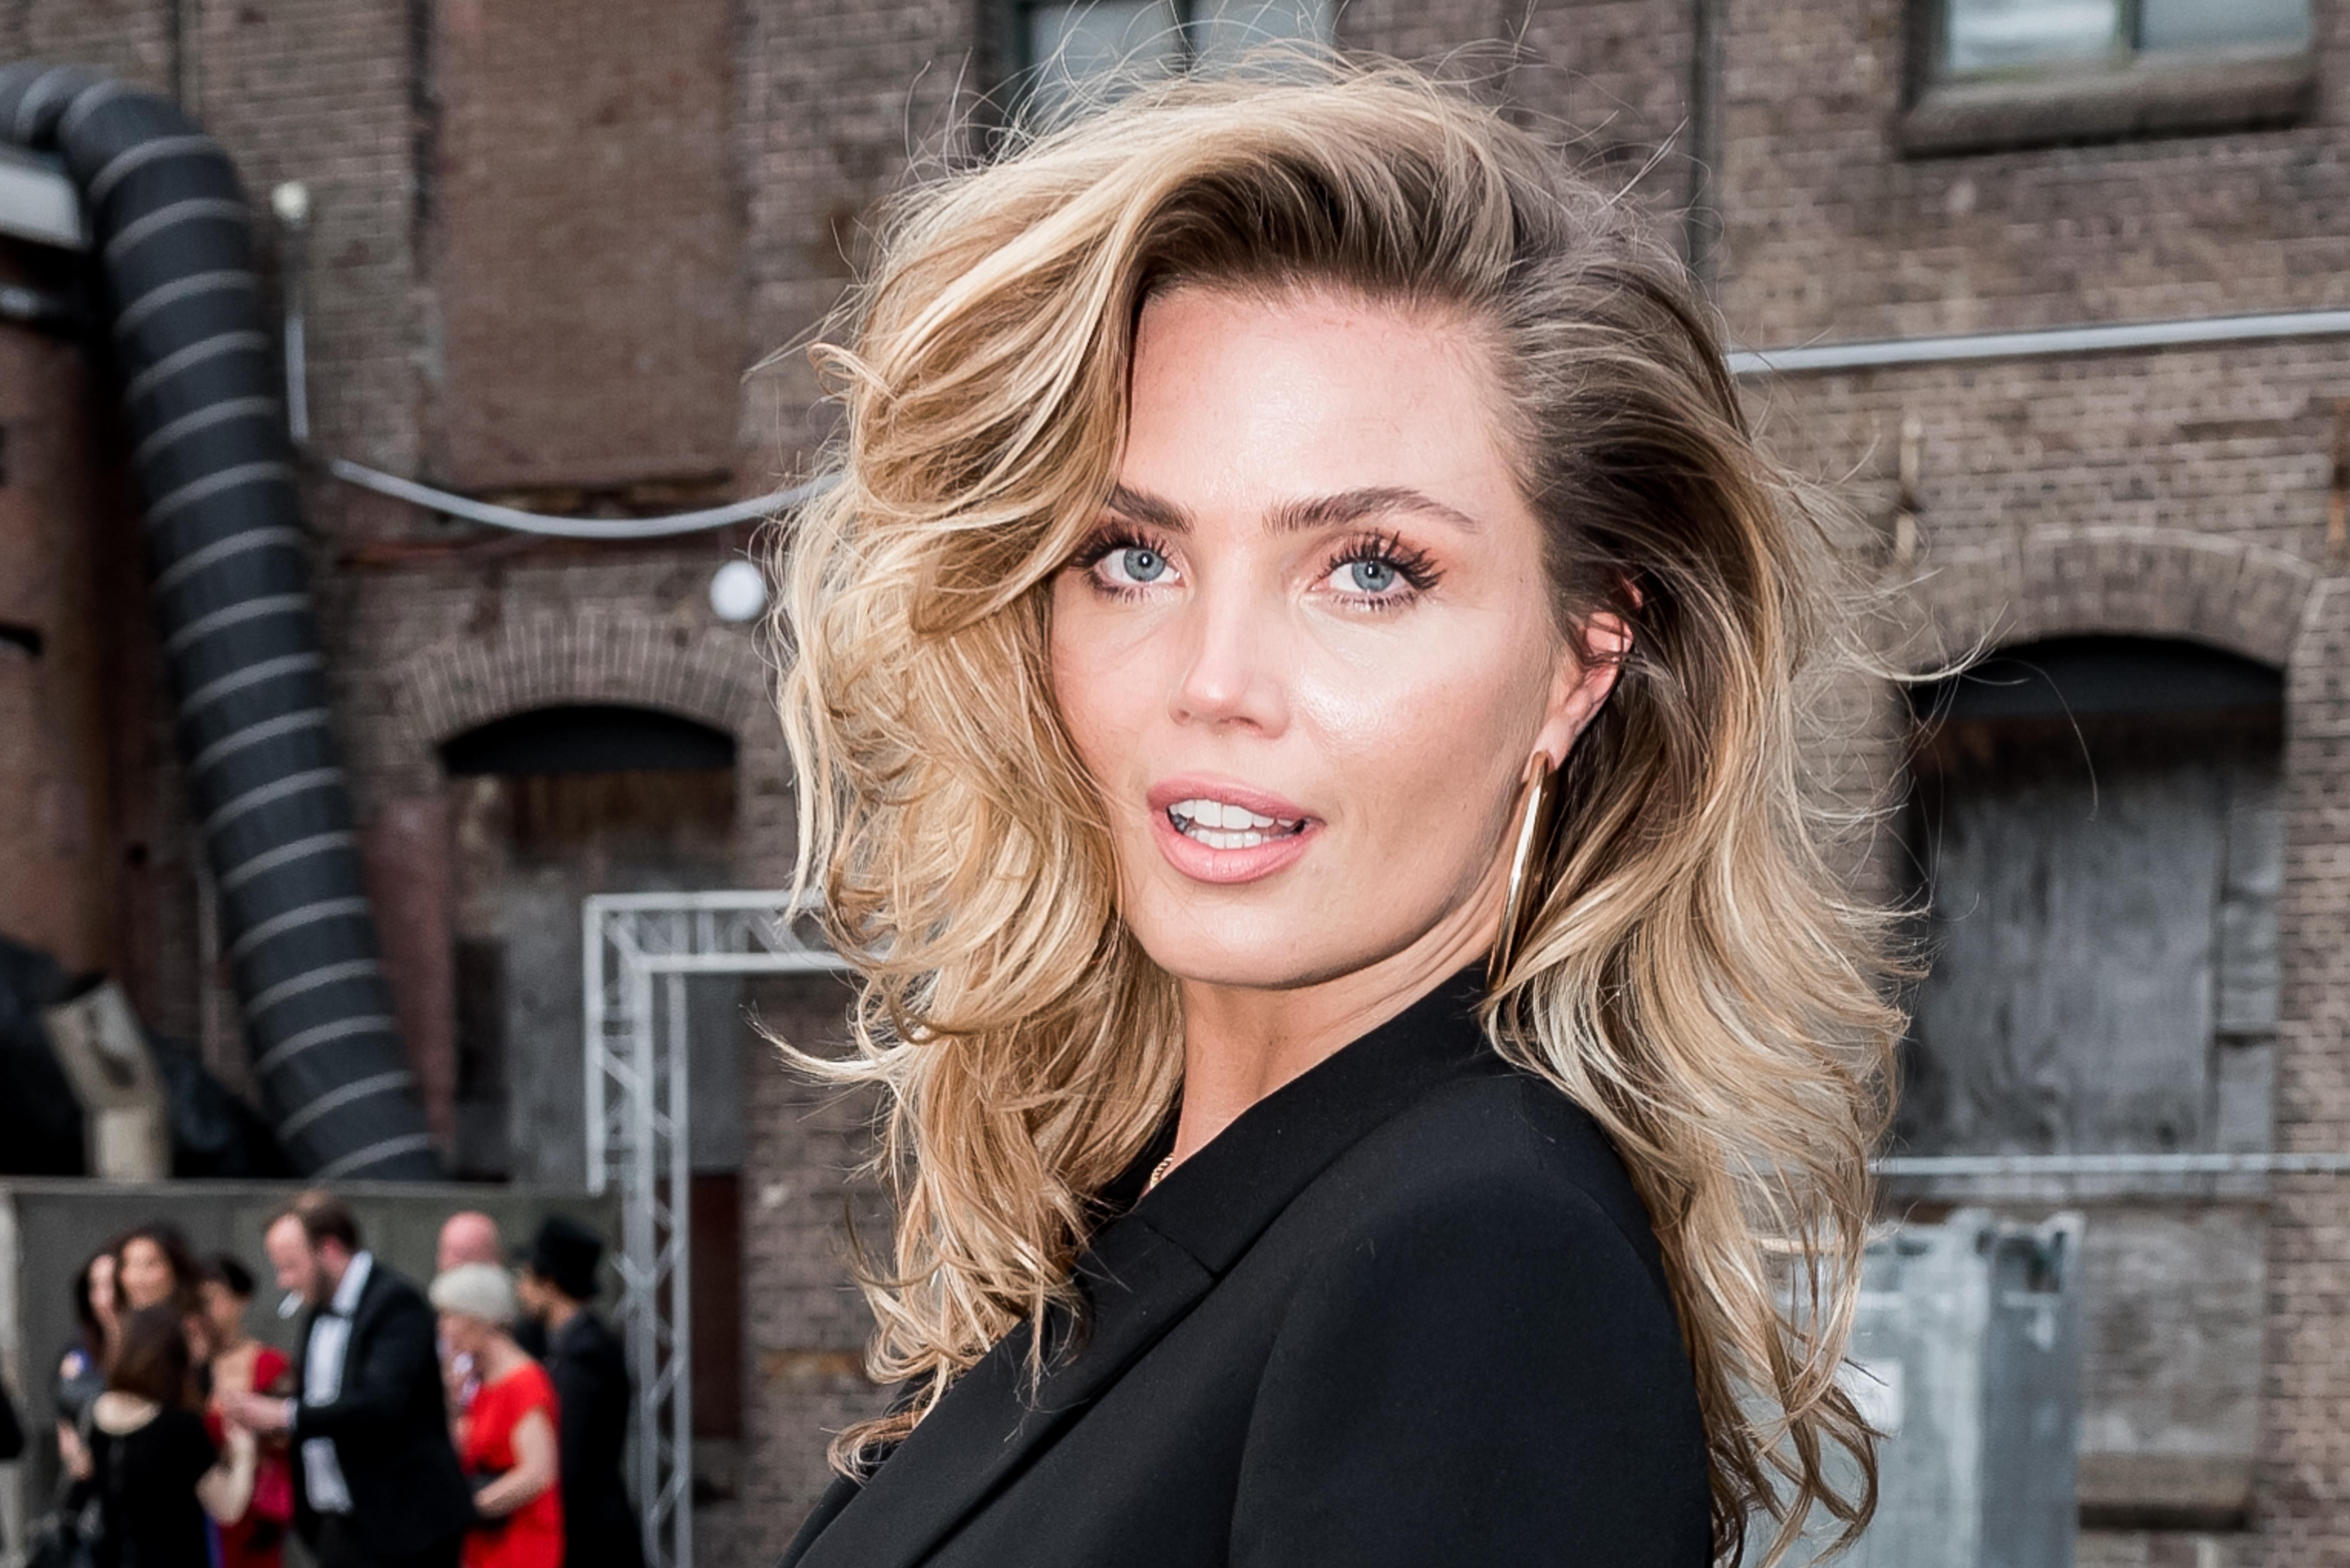 Angela Schijf Sexy kim feenstra in sprookjesfilm   lifestyle   telegraaf.nl